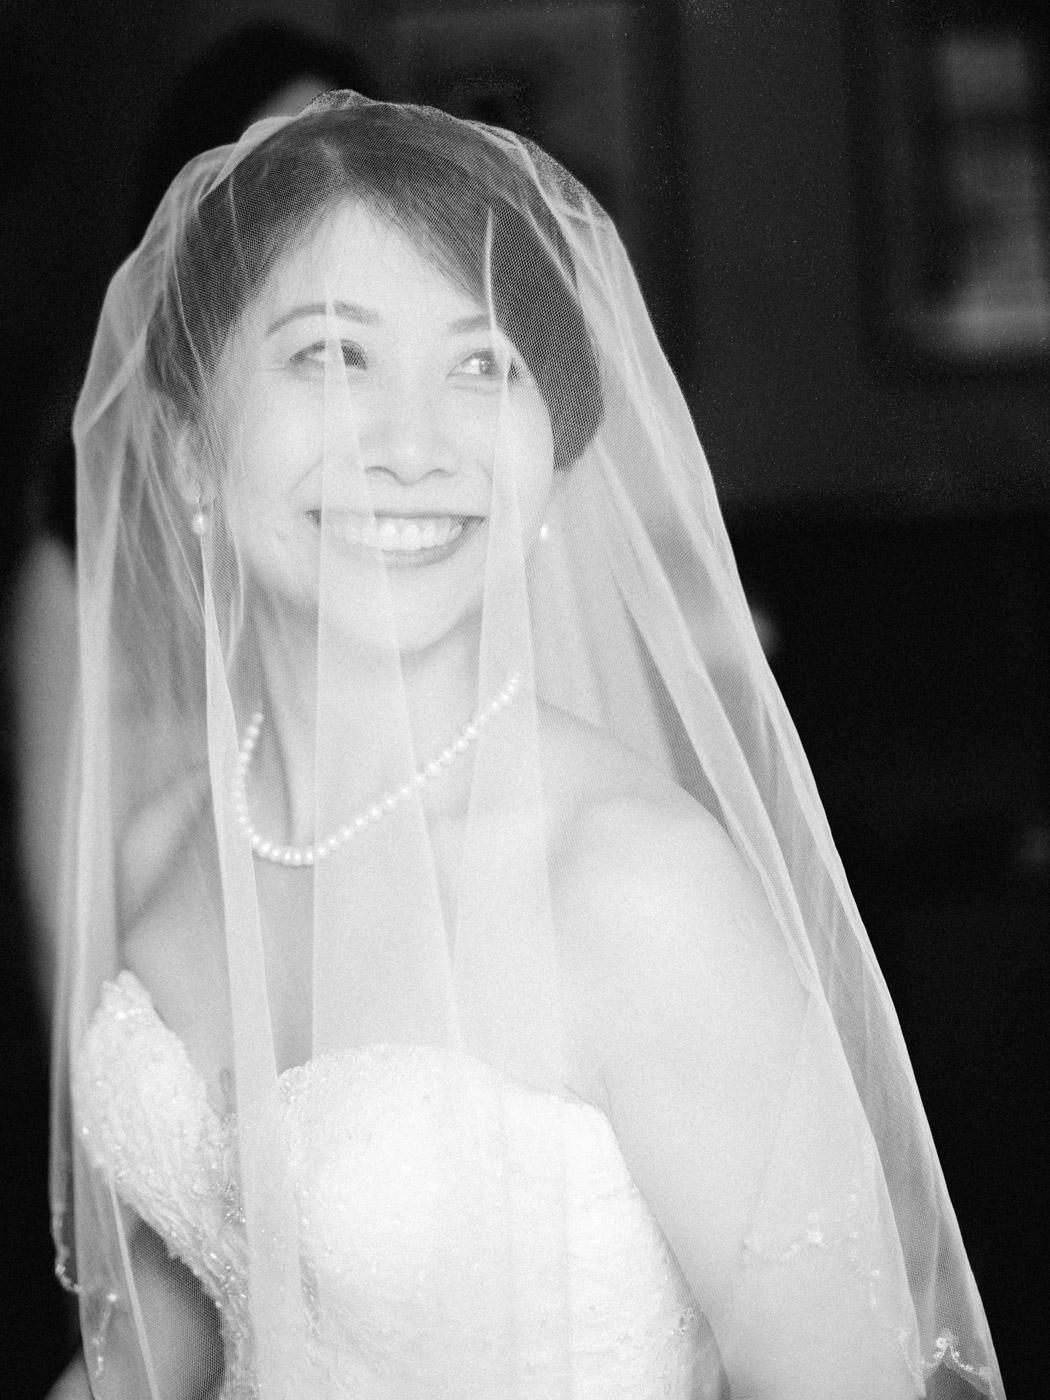 toronto_wedding_photographer_fine_art_documentary_photography-59.jpg